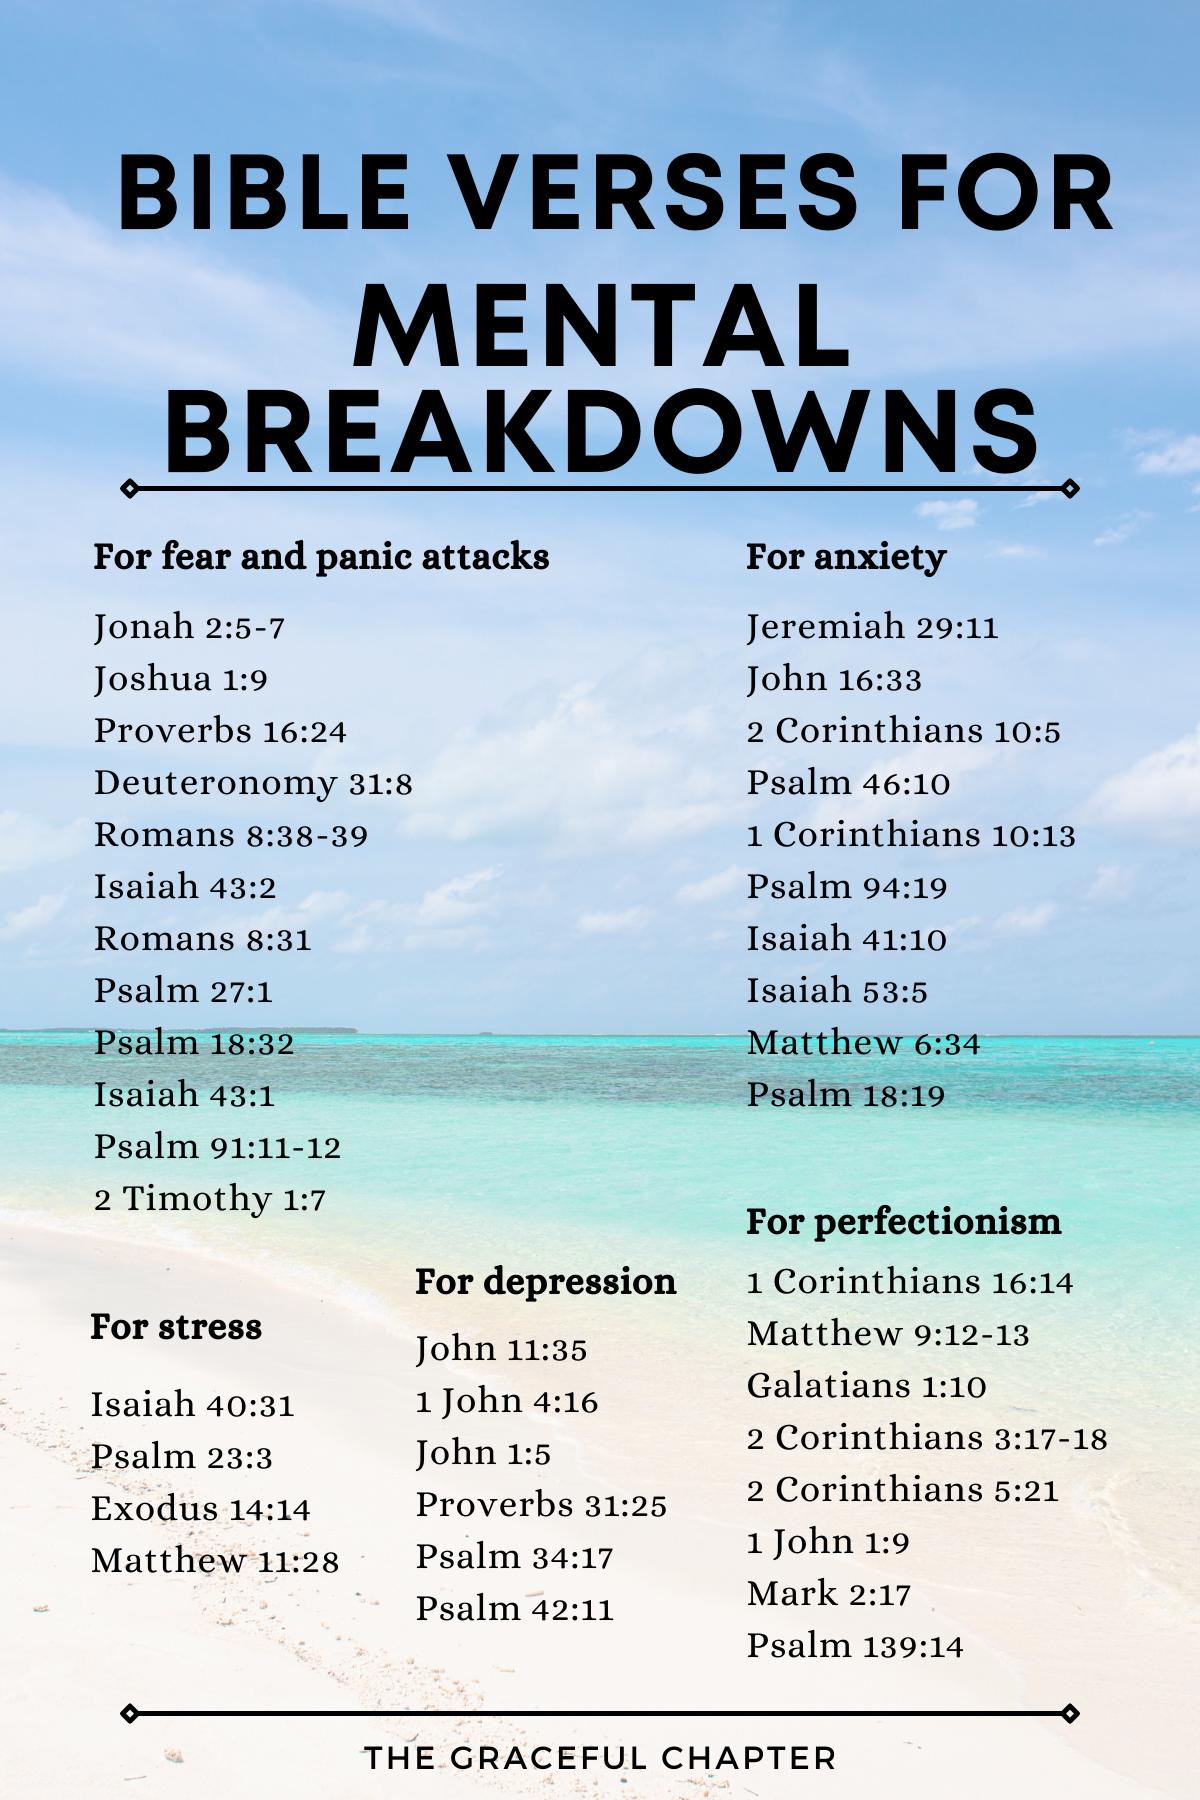 bible verses for mental breakdowns